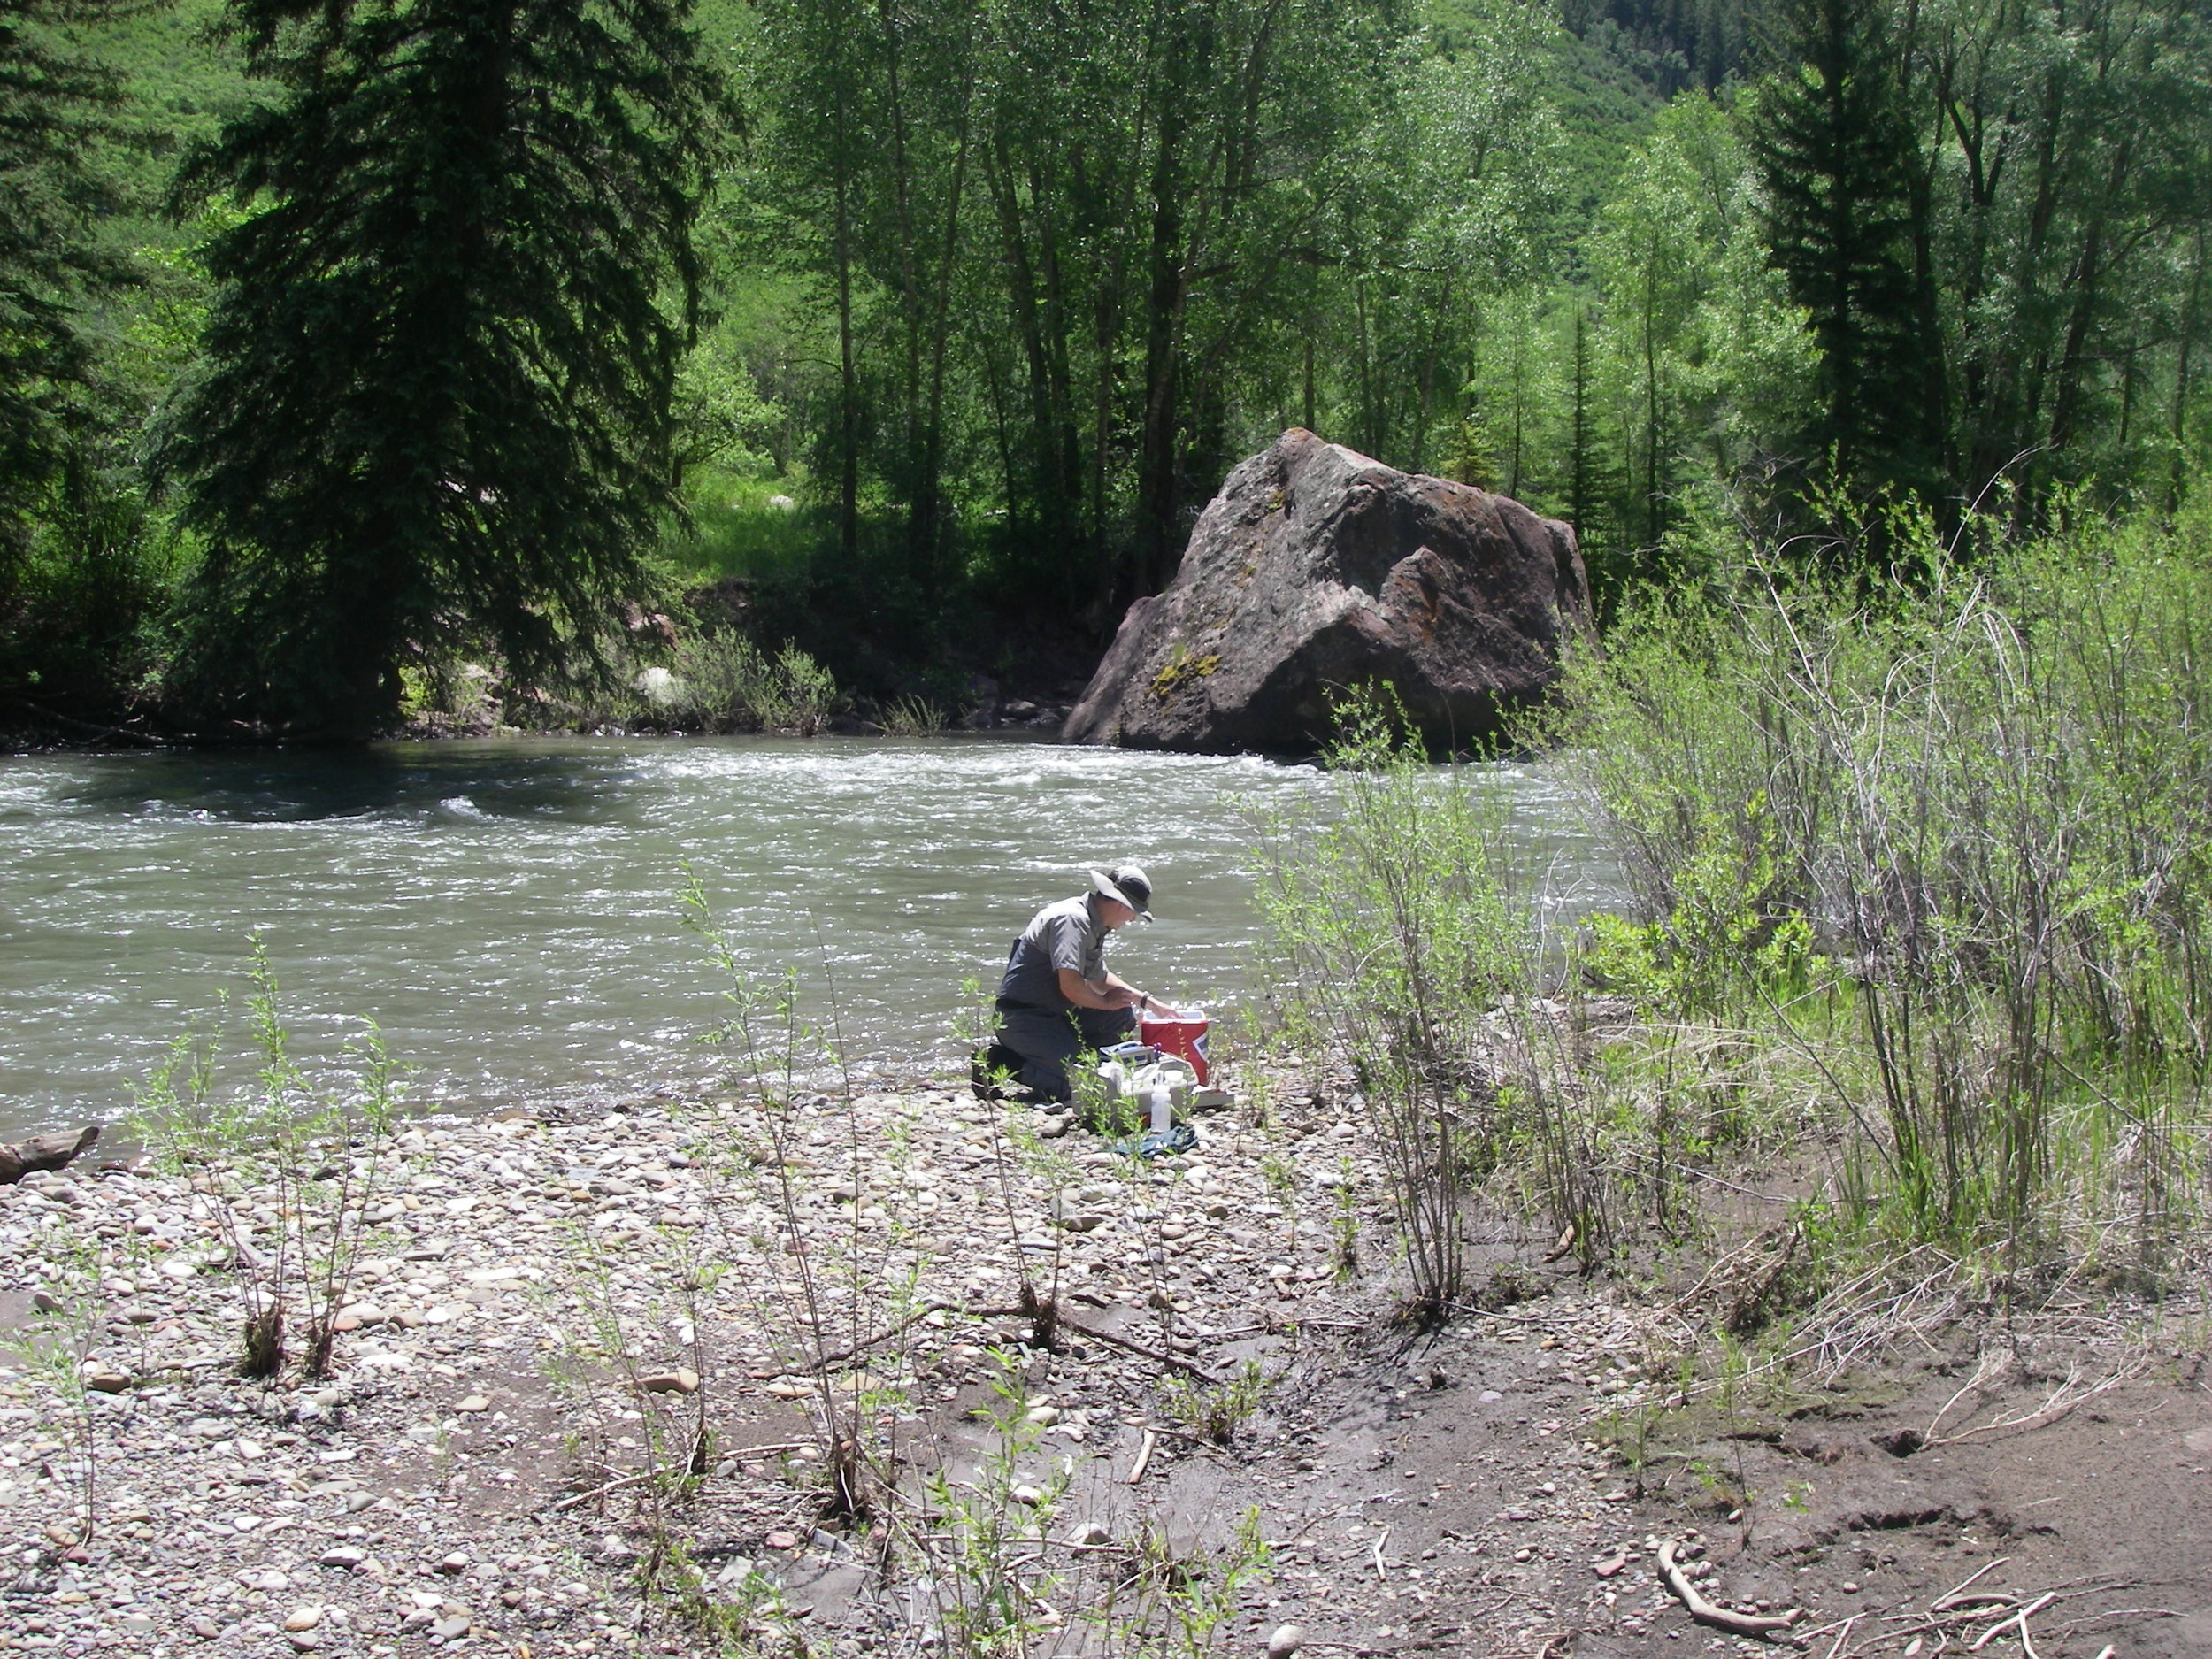 Photo Courtesy Roaring Fork Conservancy